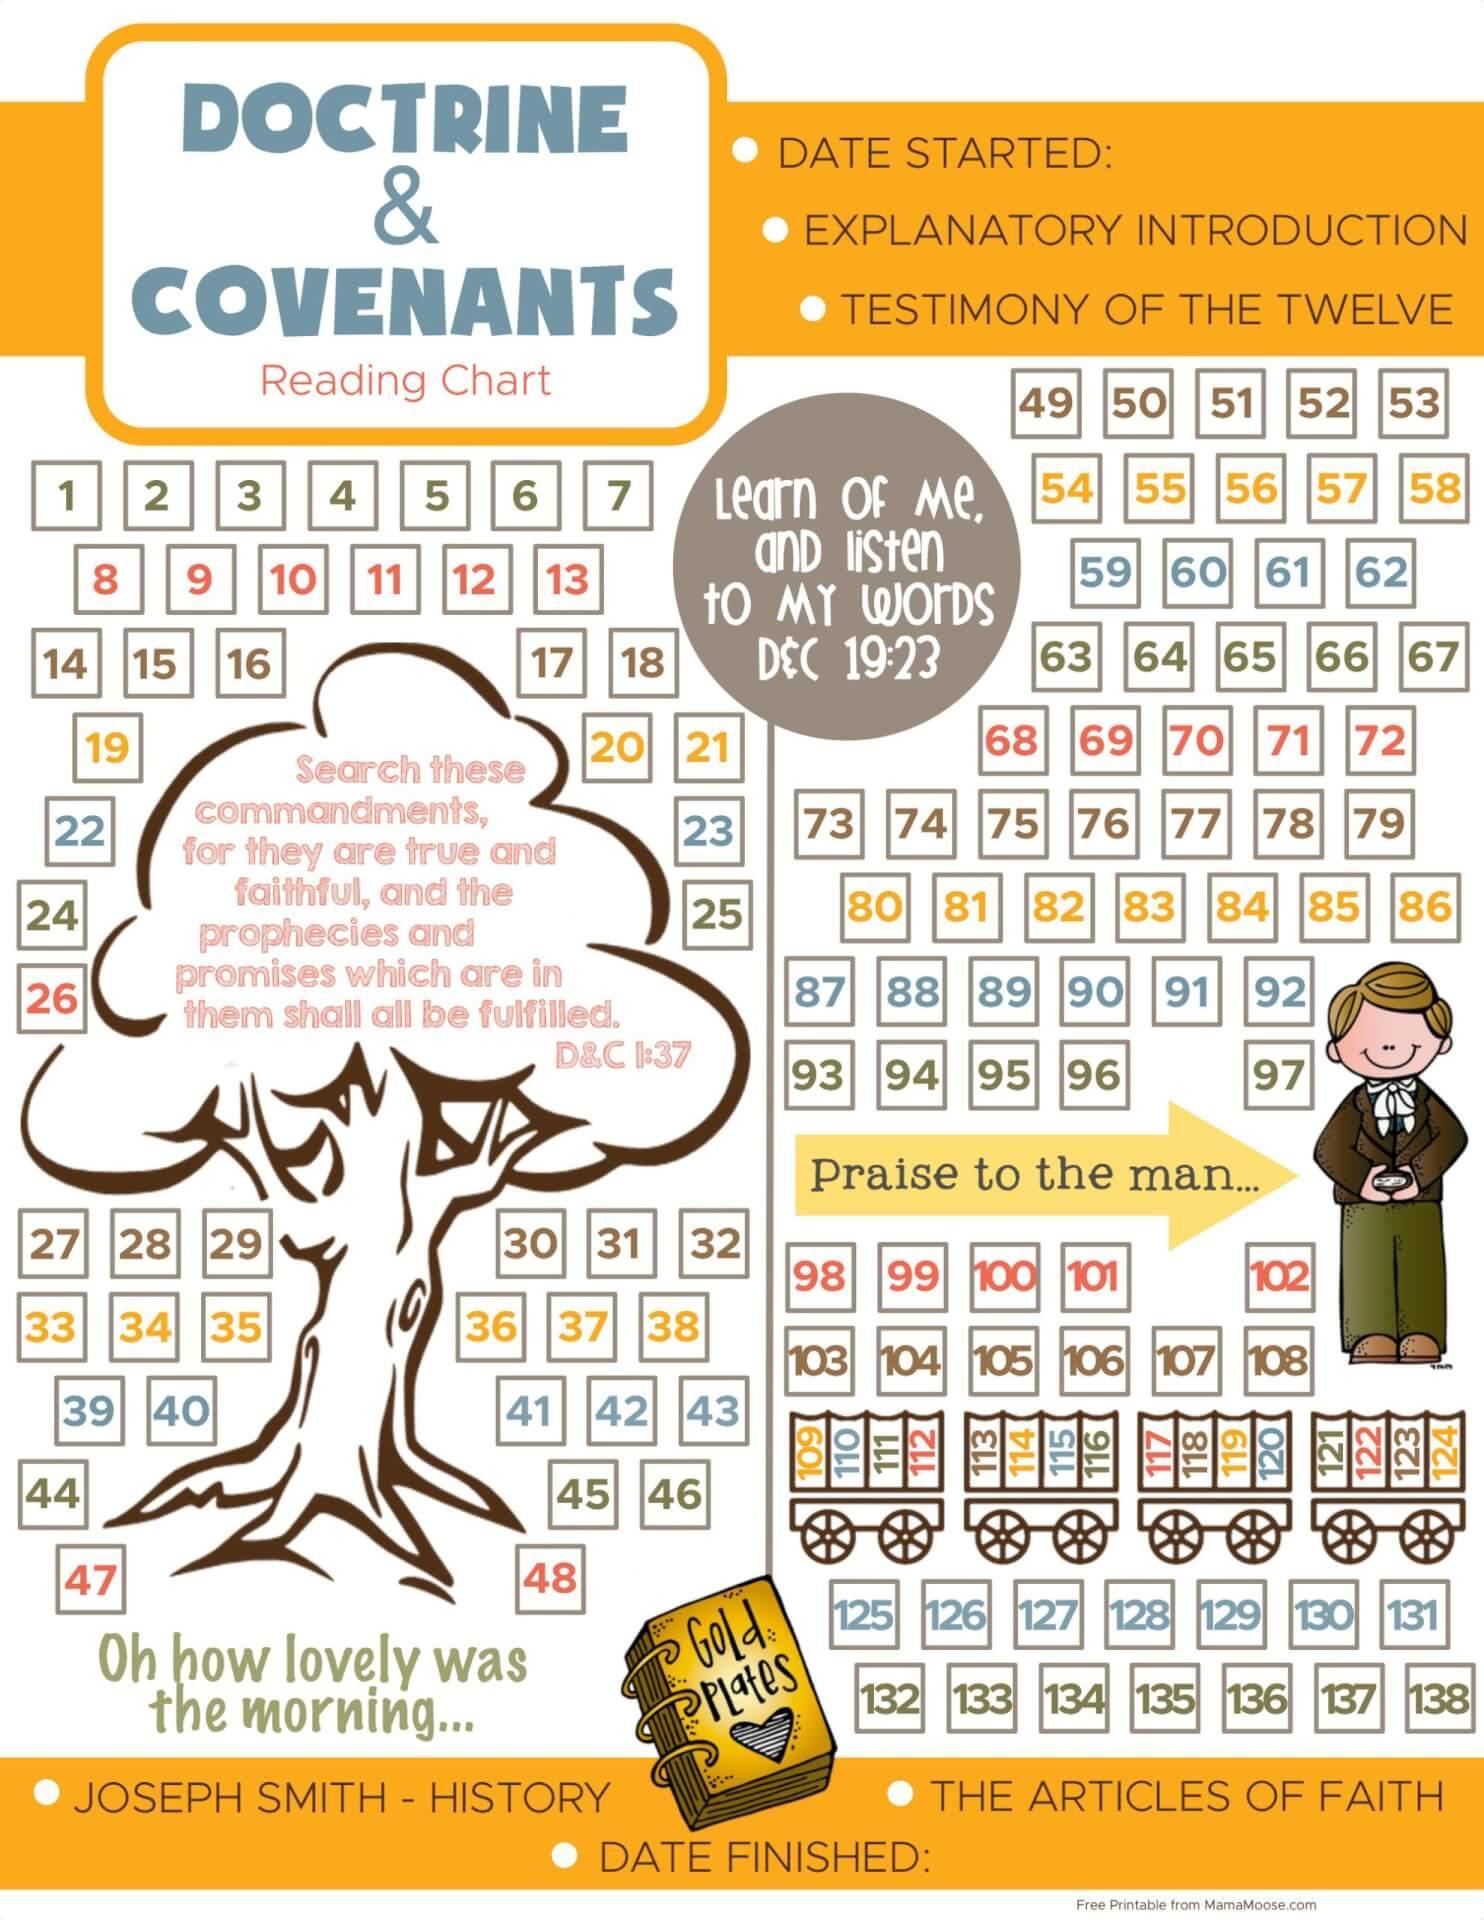 Doctrine & Covenants Reading Chart